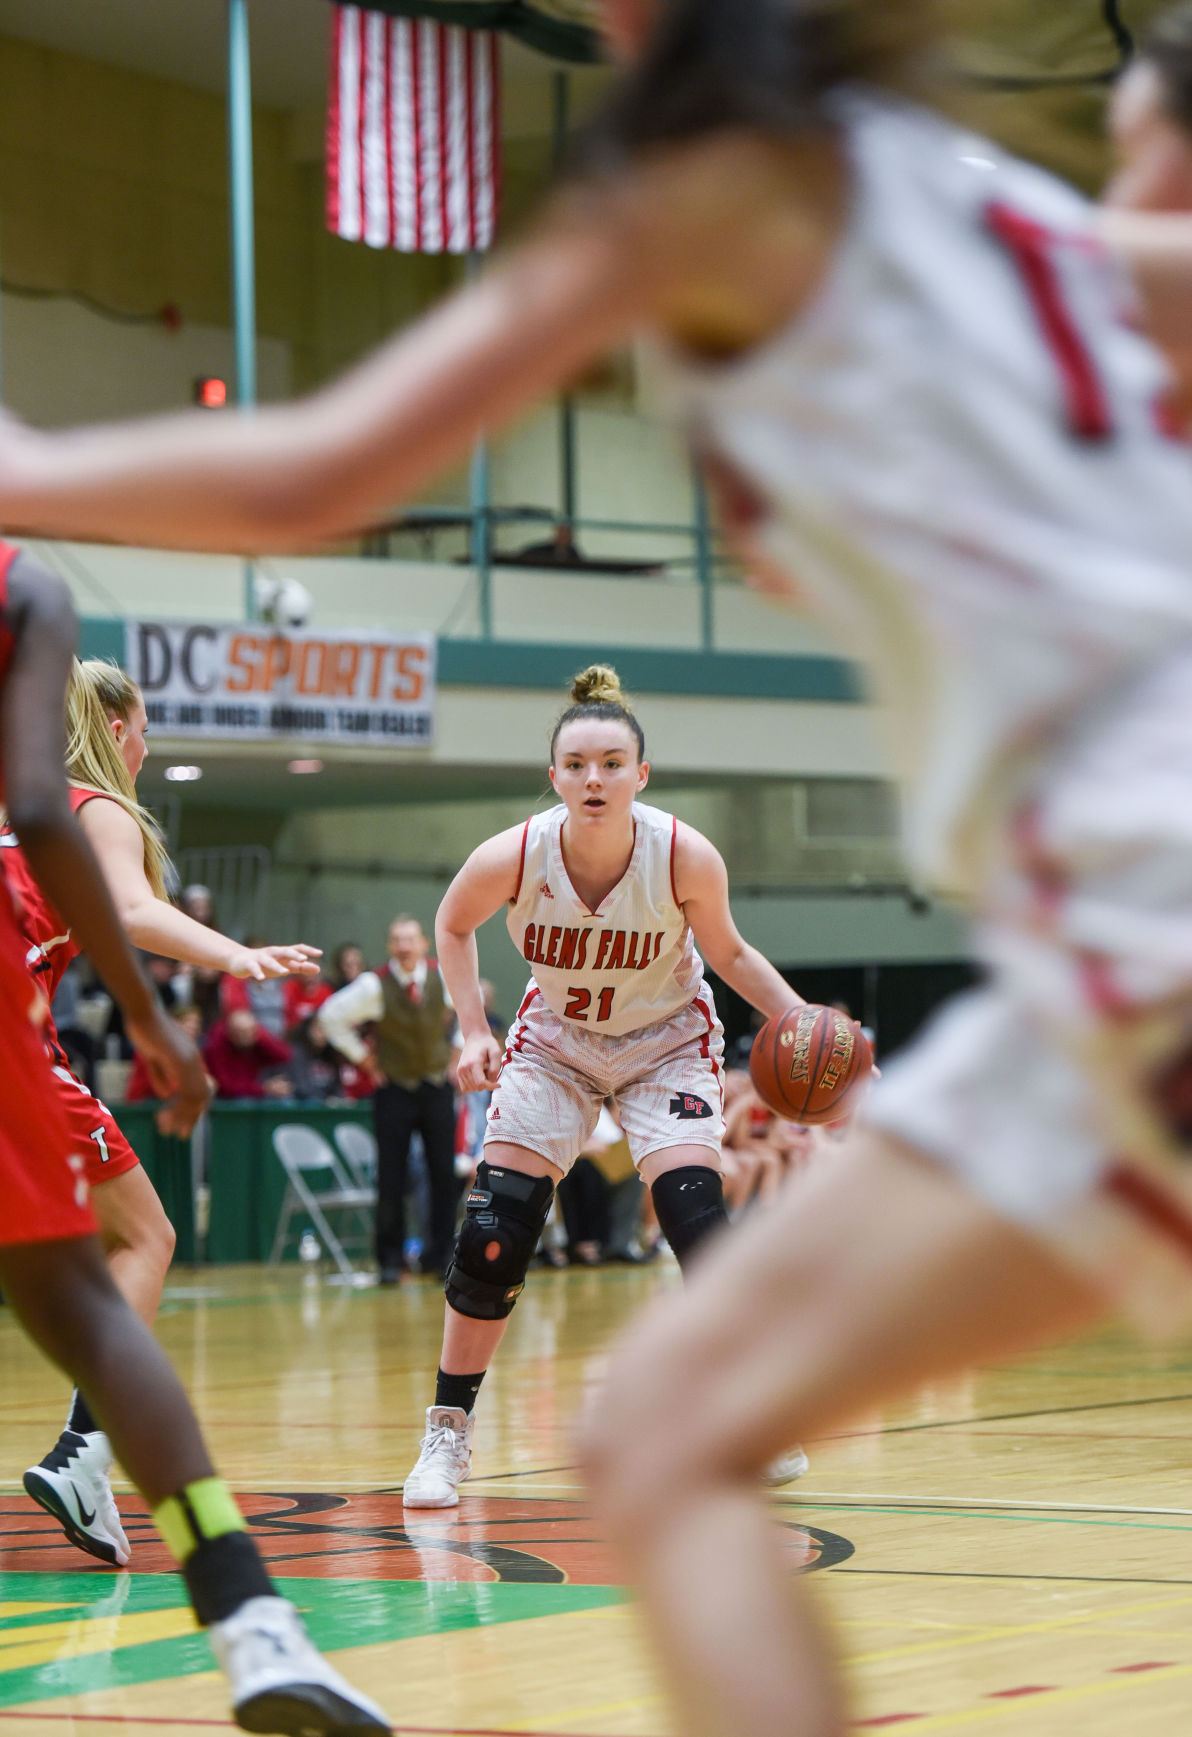 Girls basketball -- Glens Falls vs. Tamarac (copy)